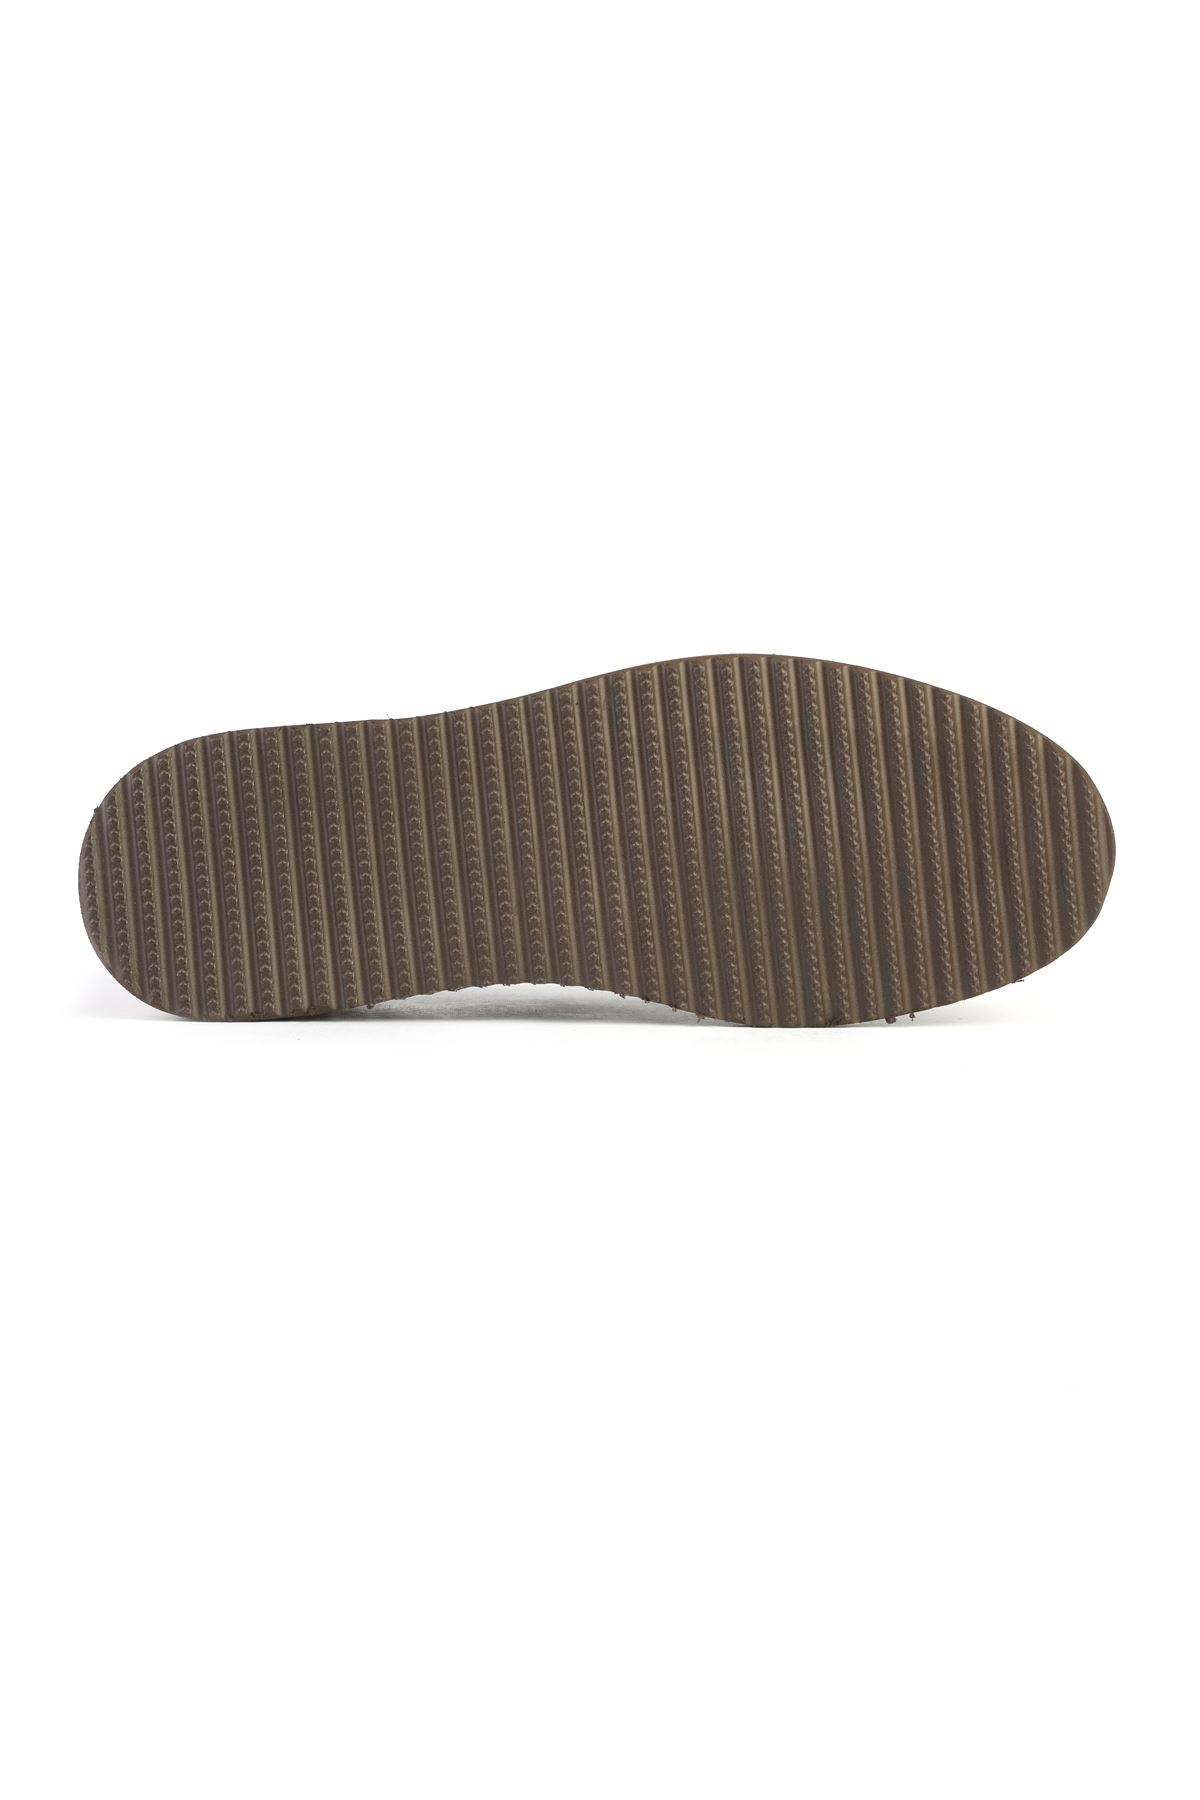 Libero 3295 Tan Loafer Shoes